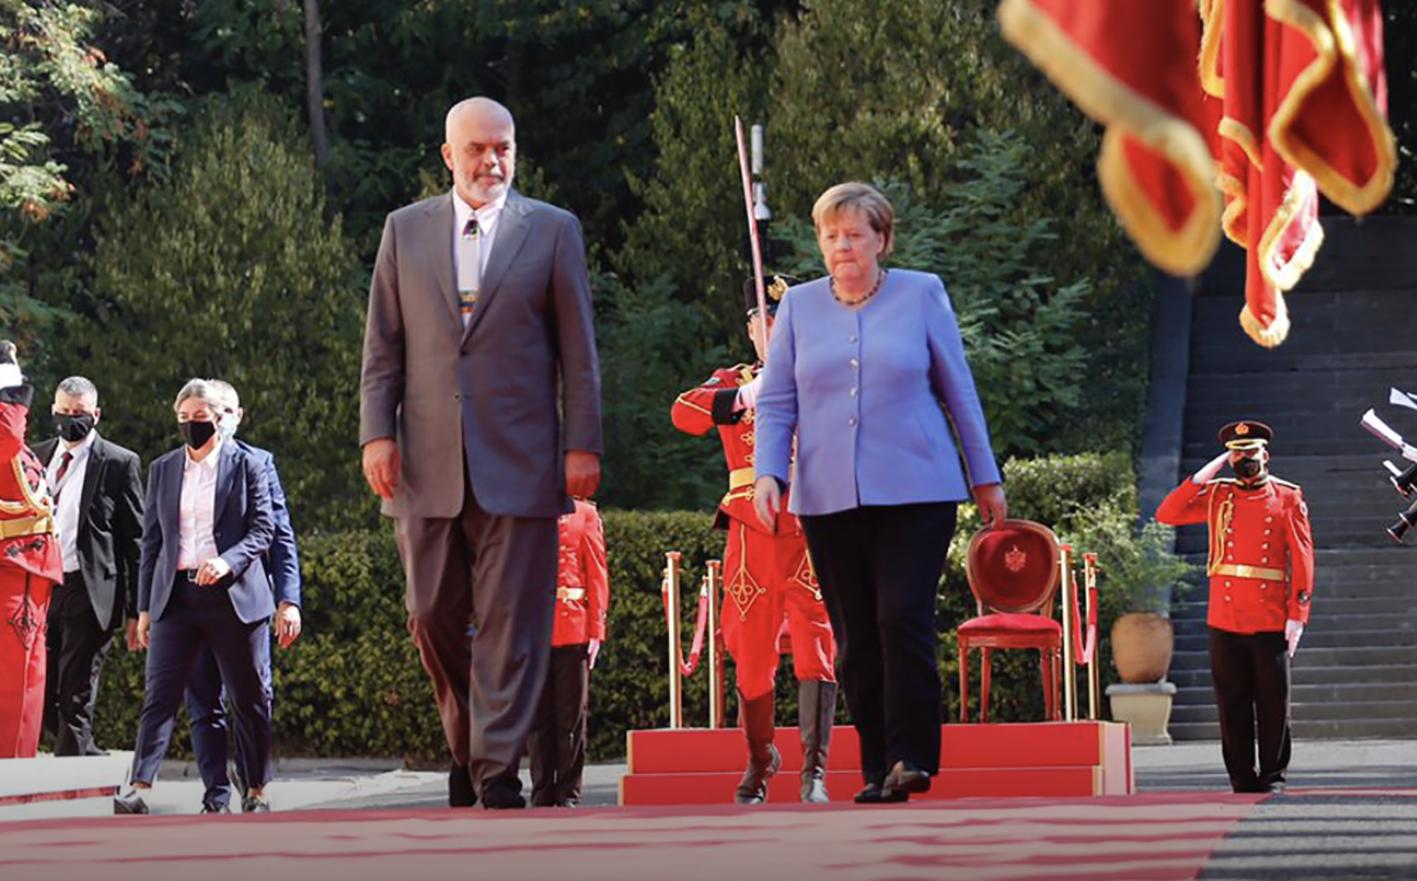 Merkel: Χαιρετίζω την πρωτοβουλία, «Ανοιχτά Βαλκάνια» και προσκαλώ κι άλλες χώρες να συμμετάσχουν